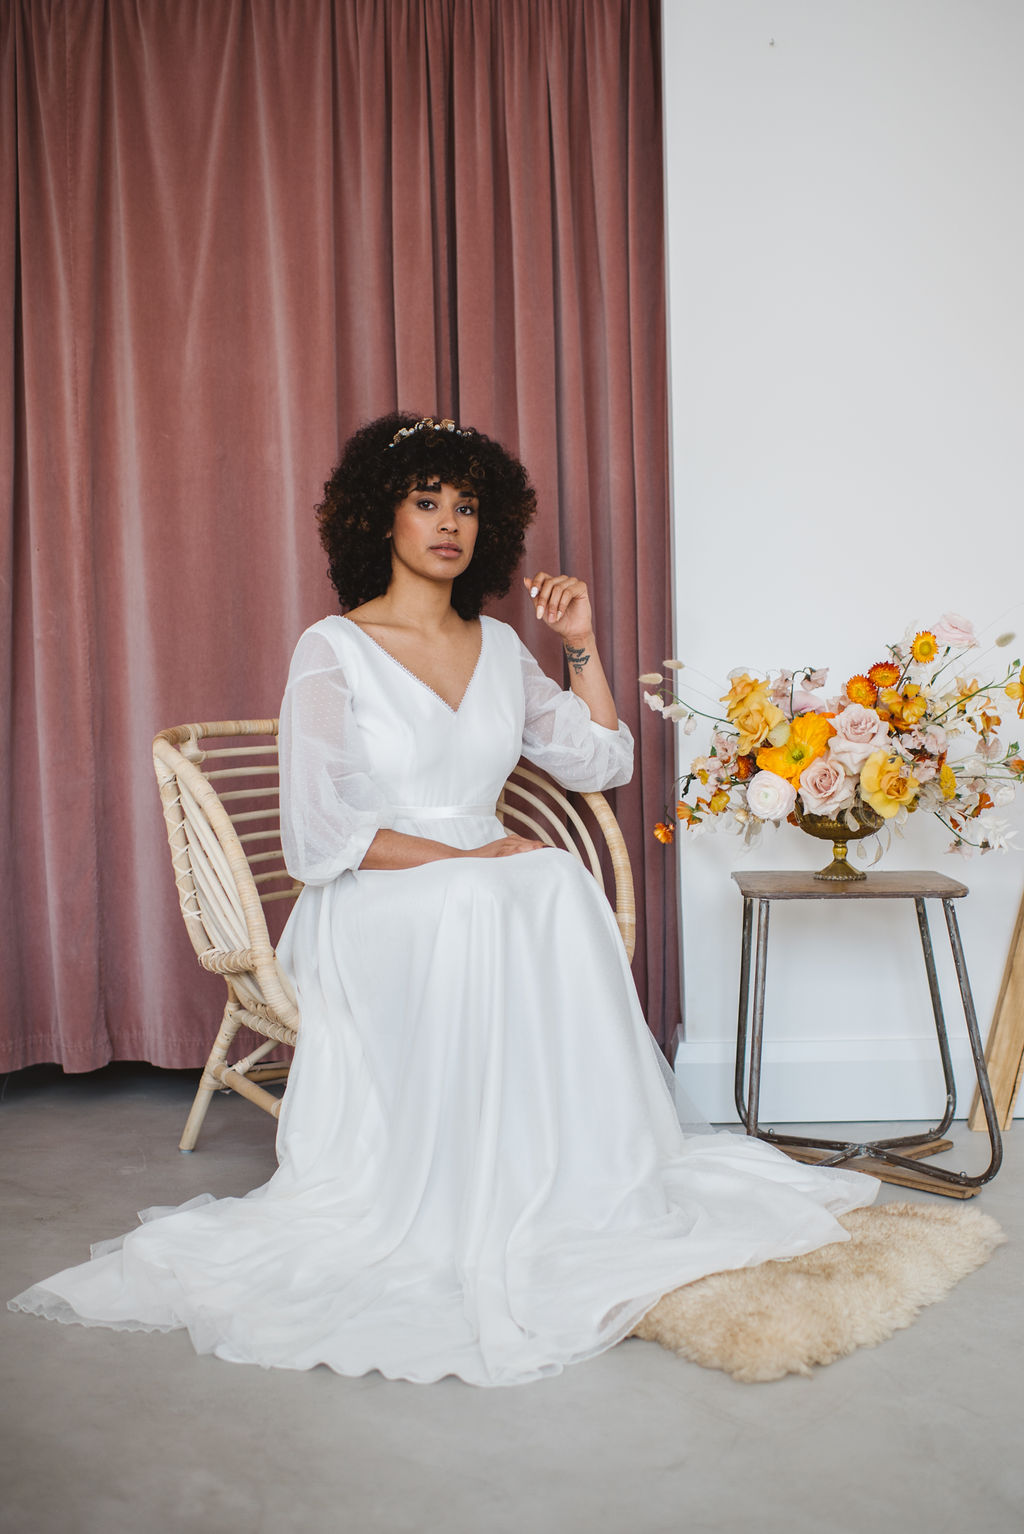 boho bridal editorial fashion shoot at ARCHIVE 12 BOUTIQUE